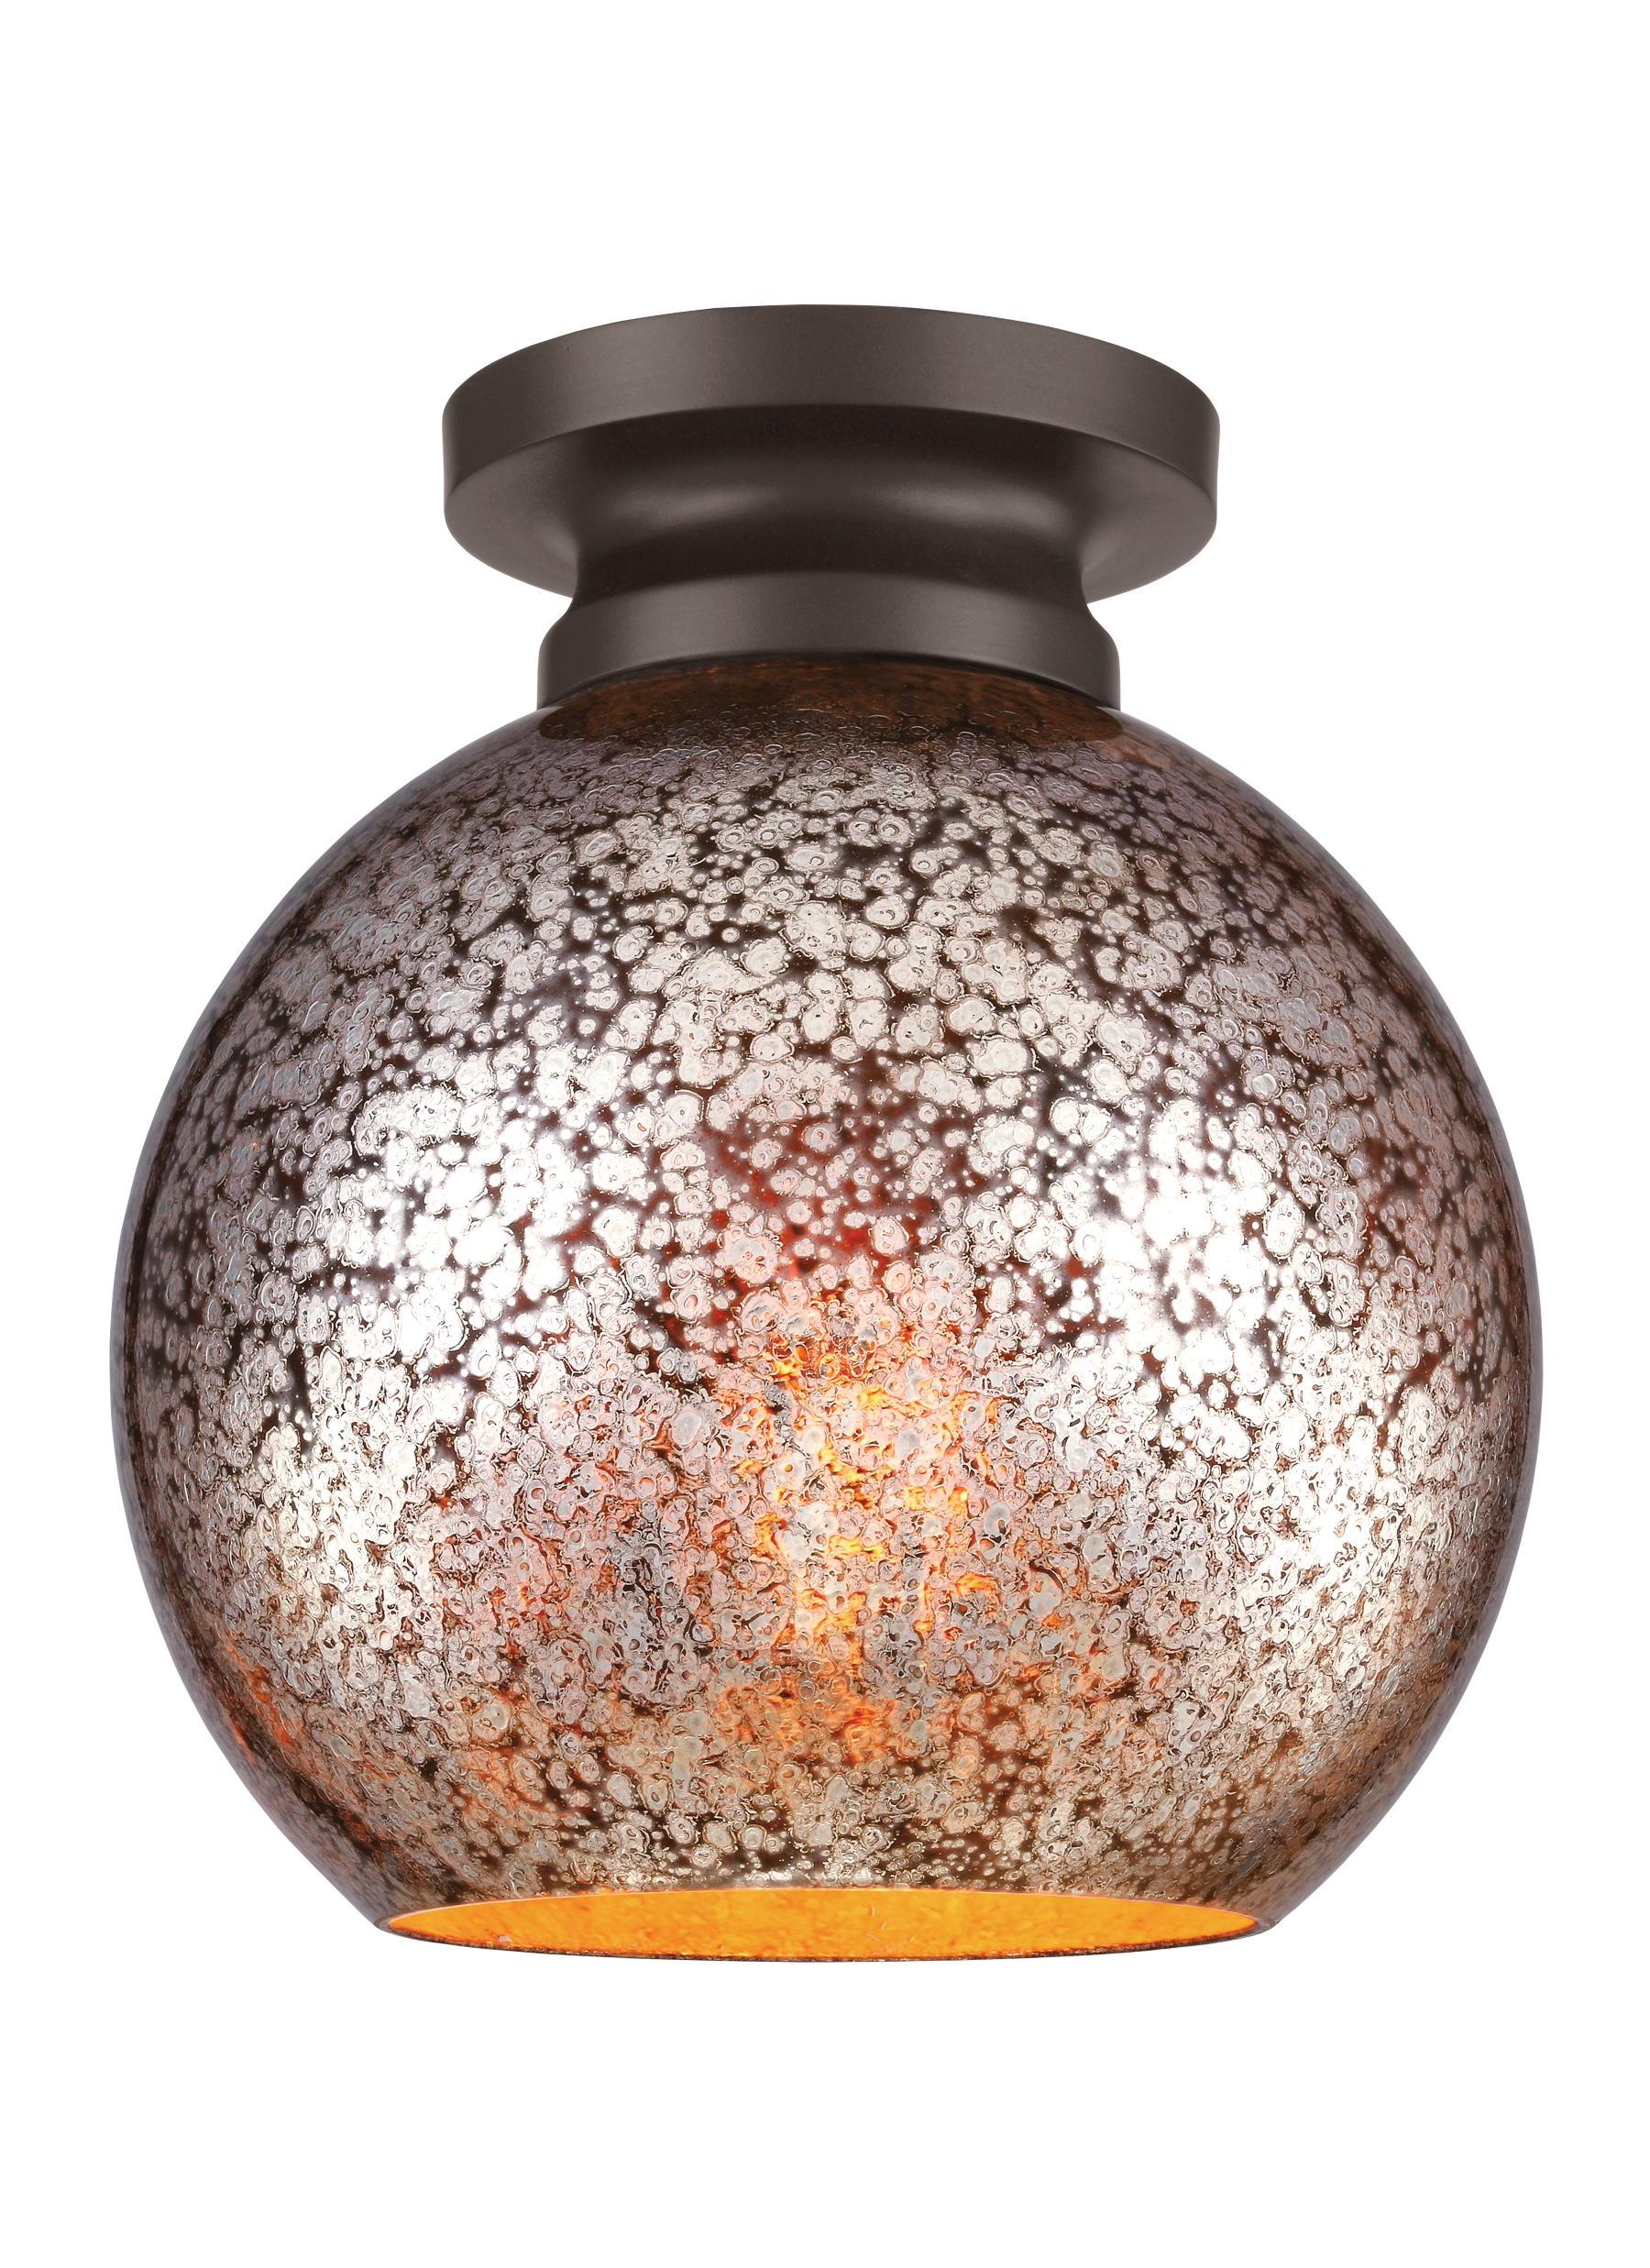 FM407ORB1 Light FlushmountOil Rubbed Bronze